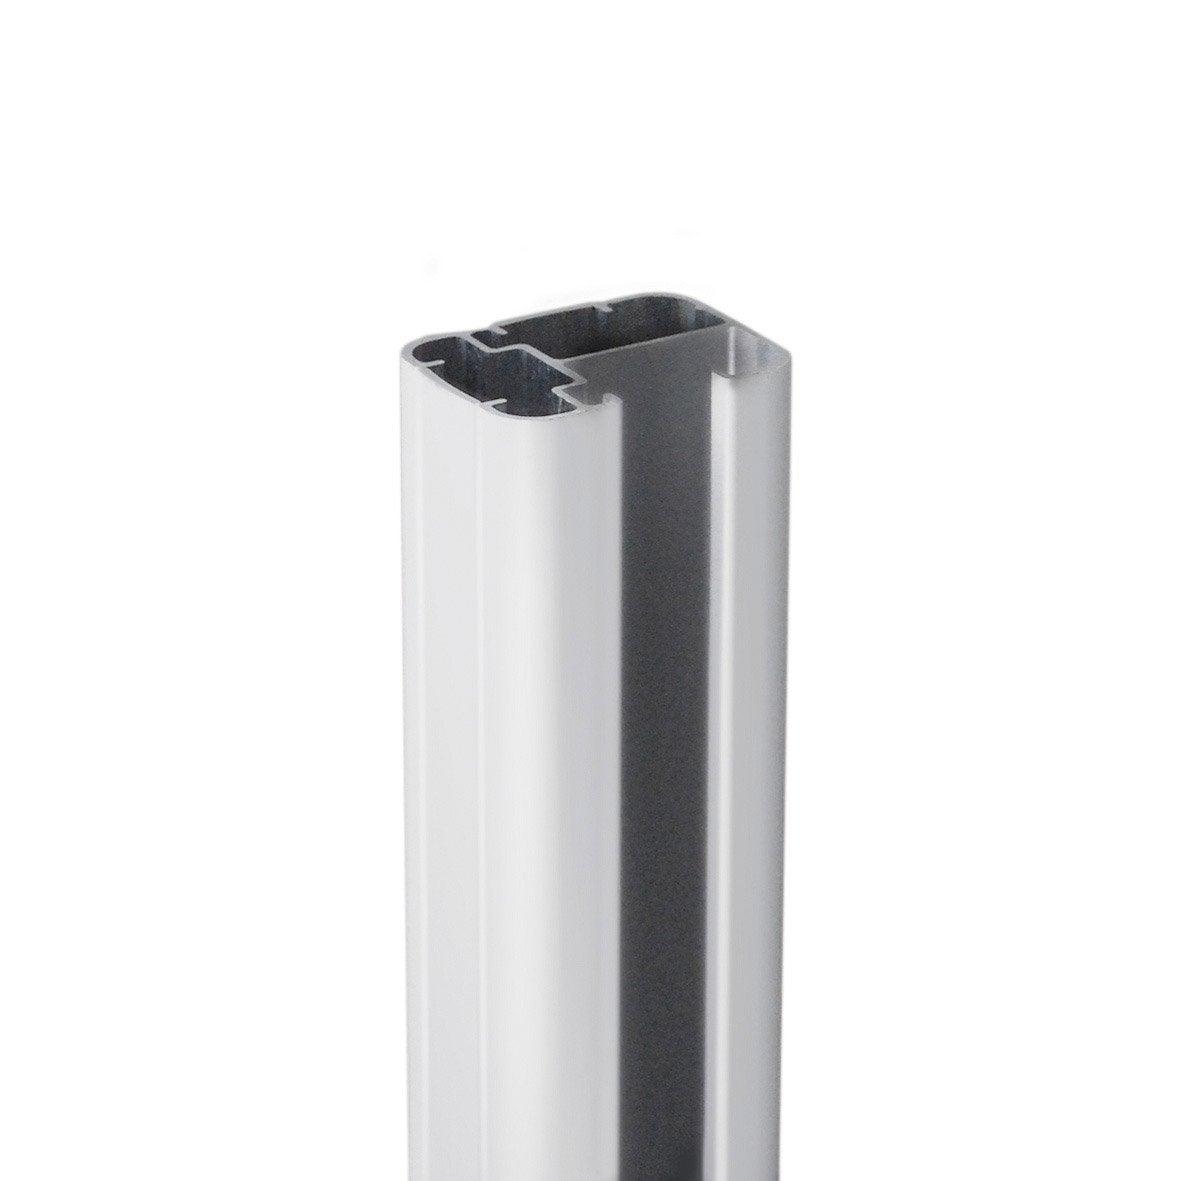 poteau en aluminium forme en h l 6 5 x p 5 x leroy merlin. Black Bedroom Furniture Sets. Home Design Ideas